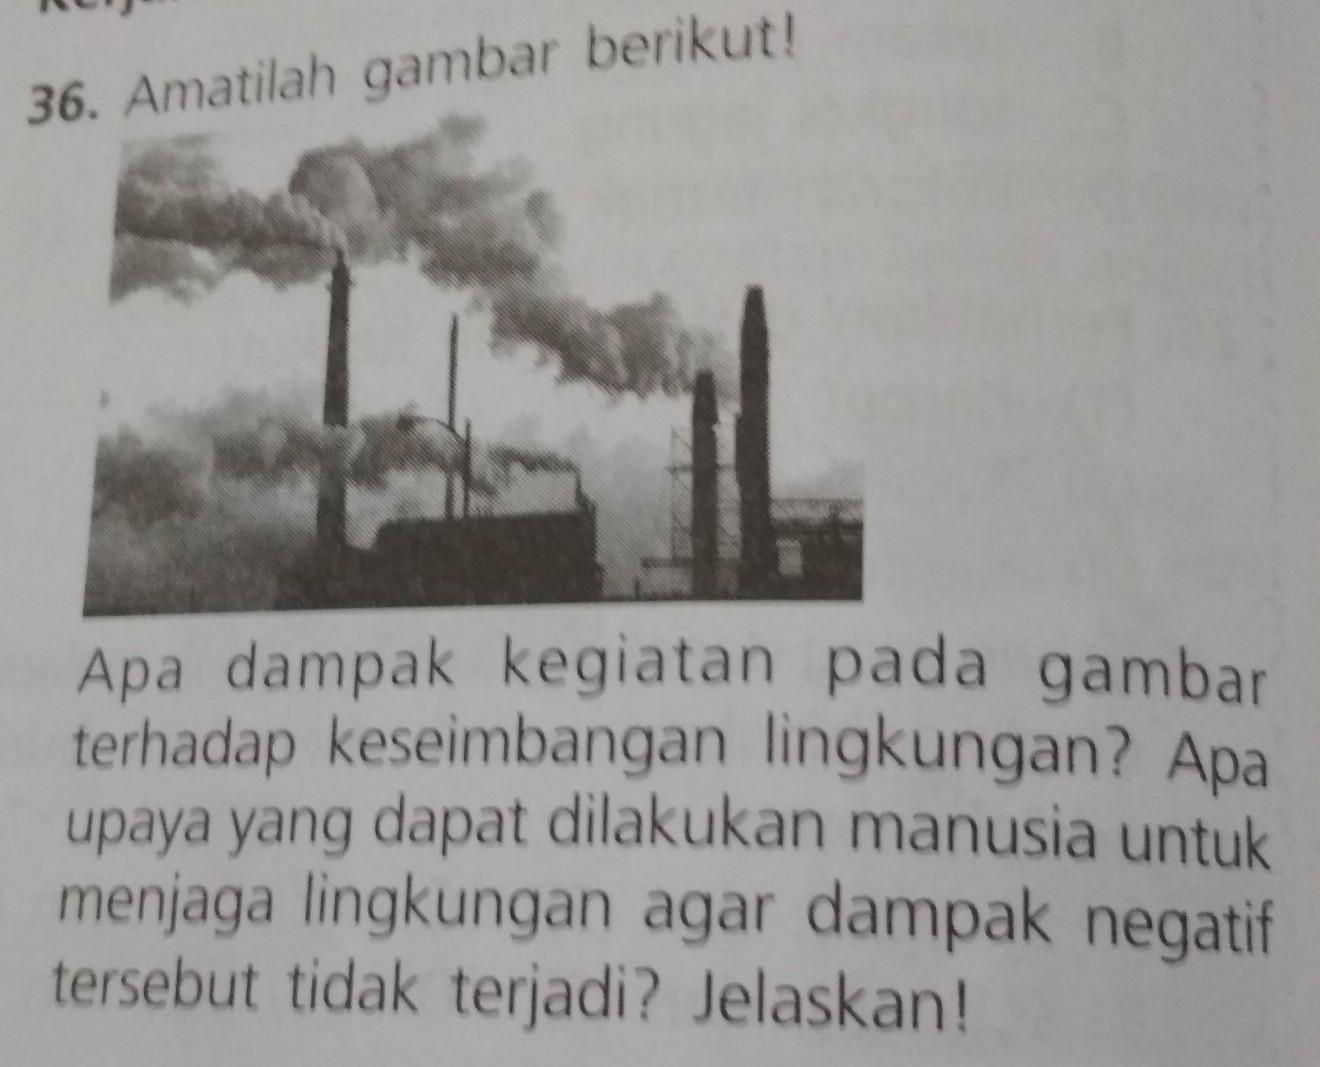 20++ Kegiatan yang menyebabkan ketidakseimbangan lingkungan adalah info